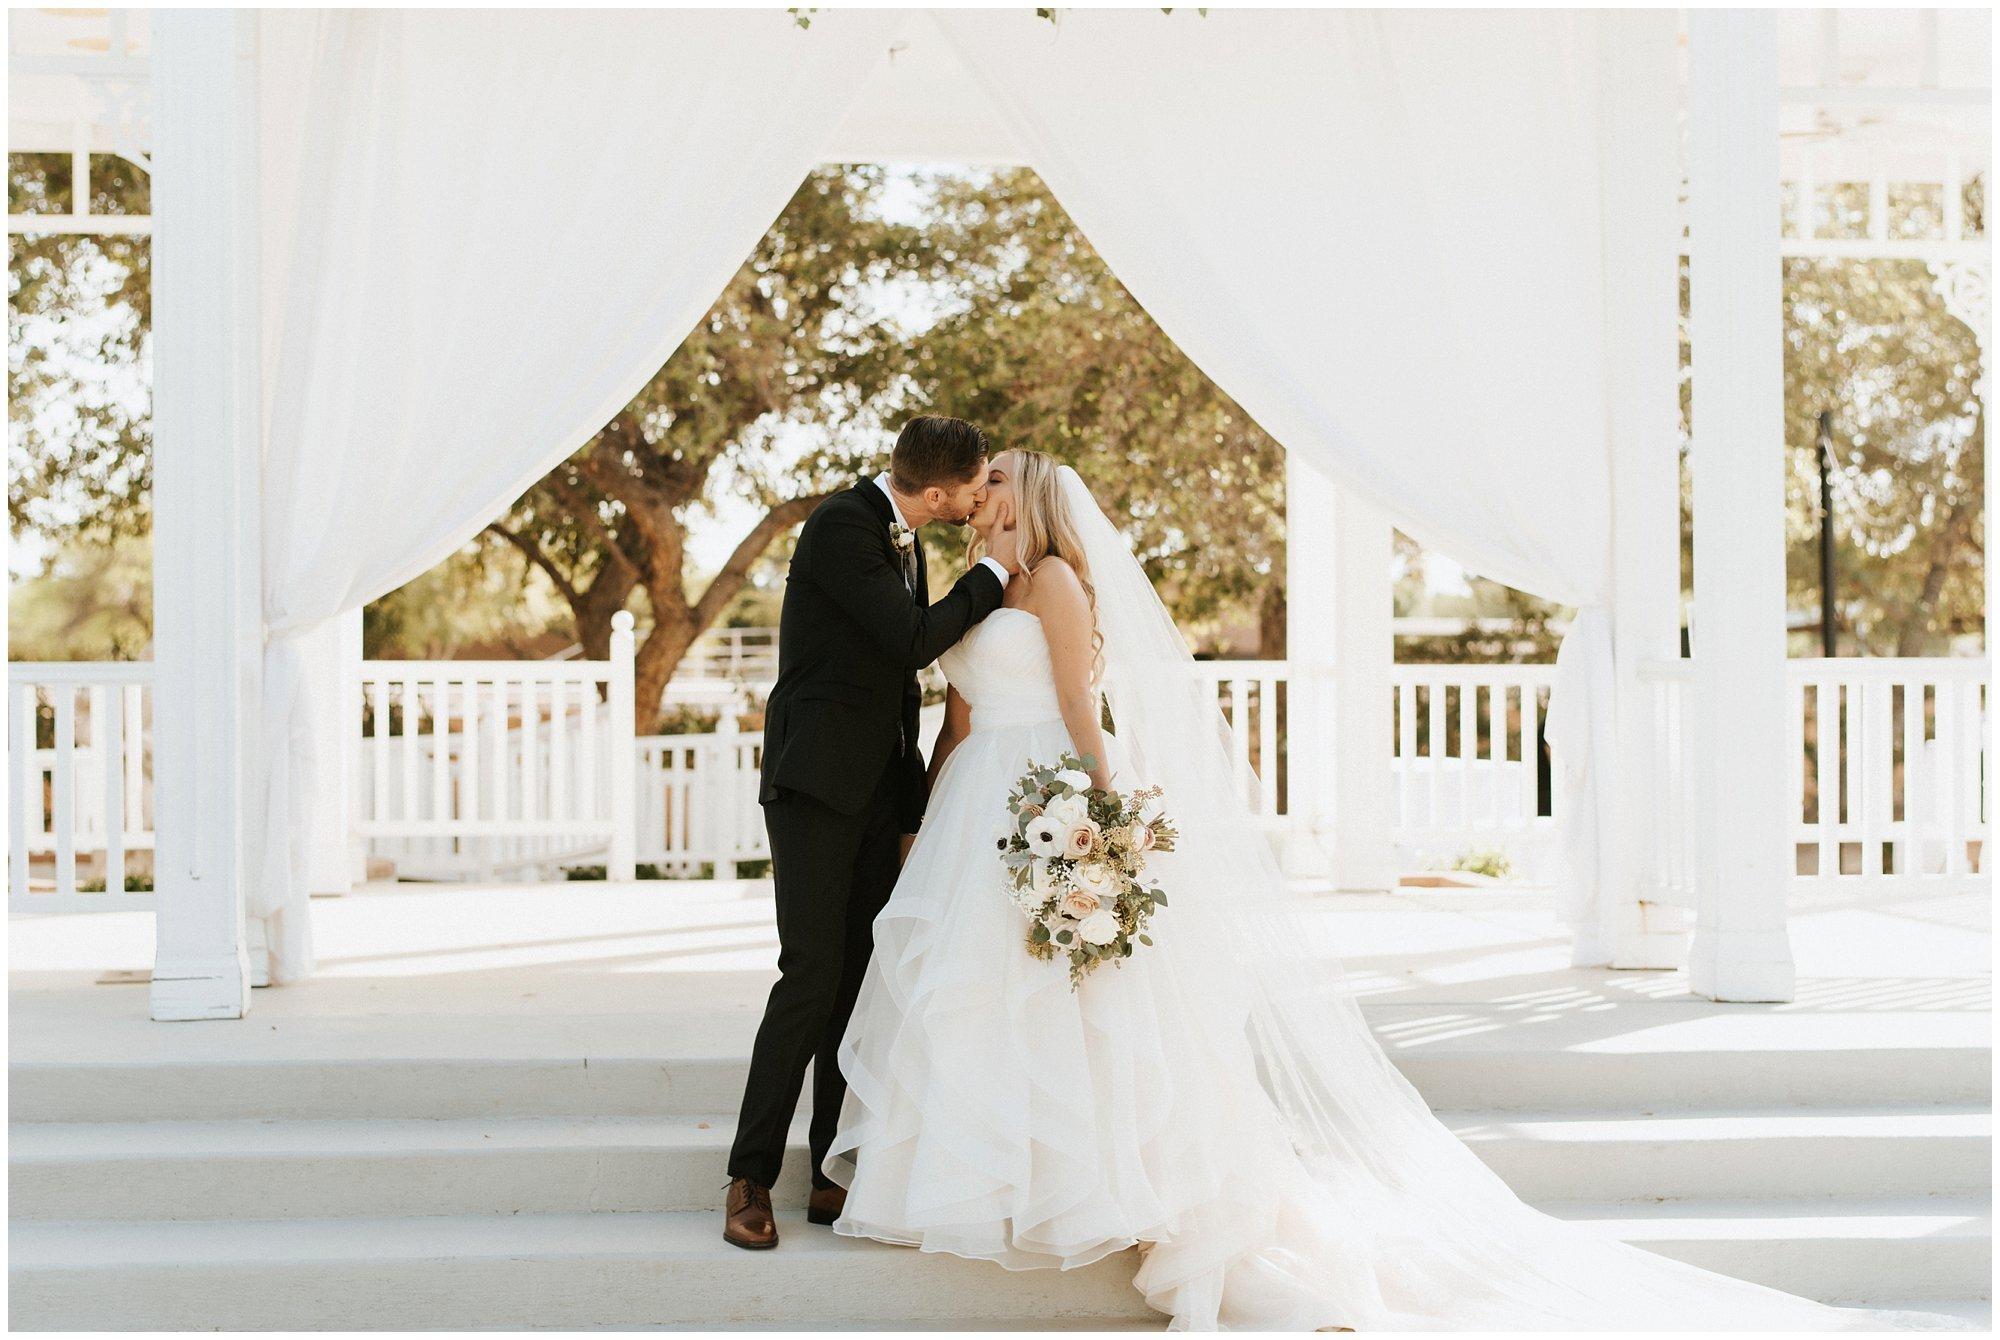 Wedgewood_Lindsay_Groves-Arizona-Wedding-Photographer-M+C_0015.jpg